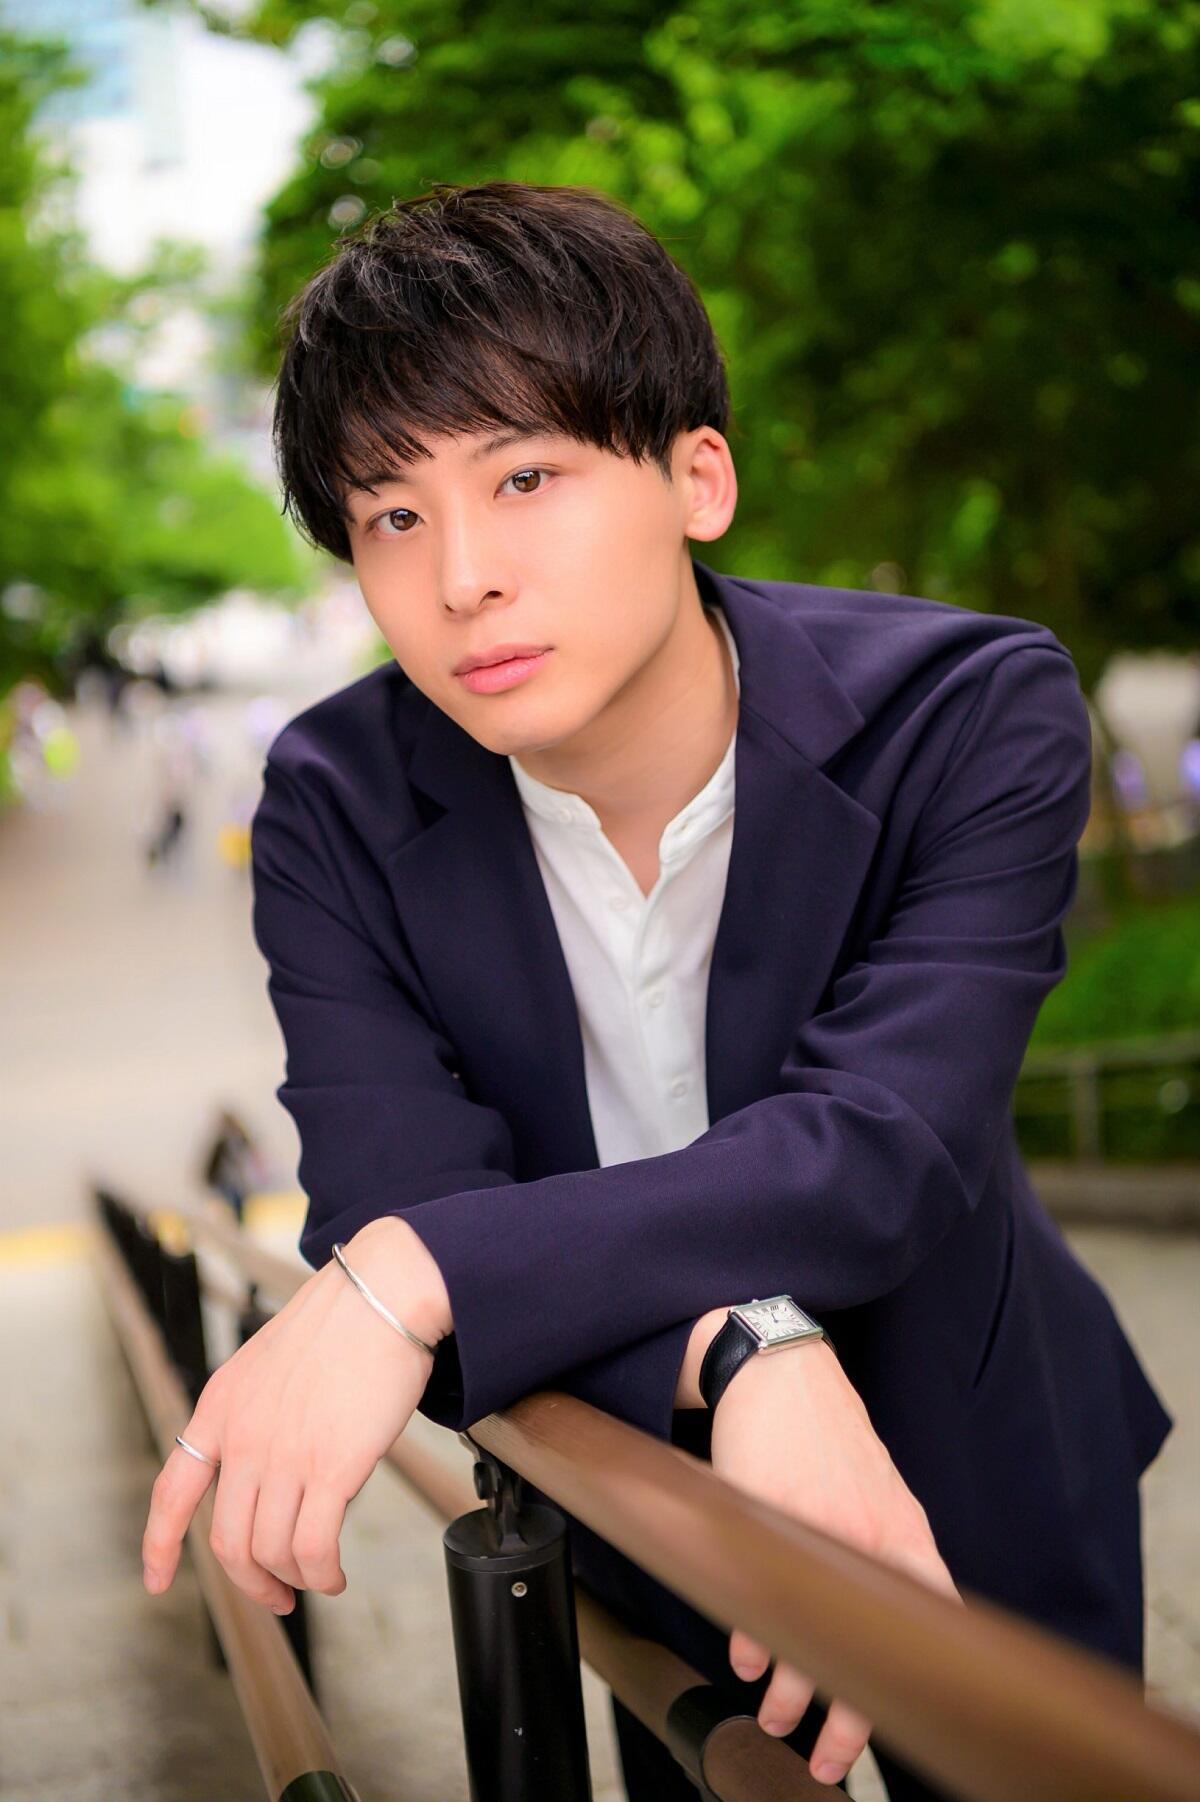 20190629_oshidan_05.jpg